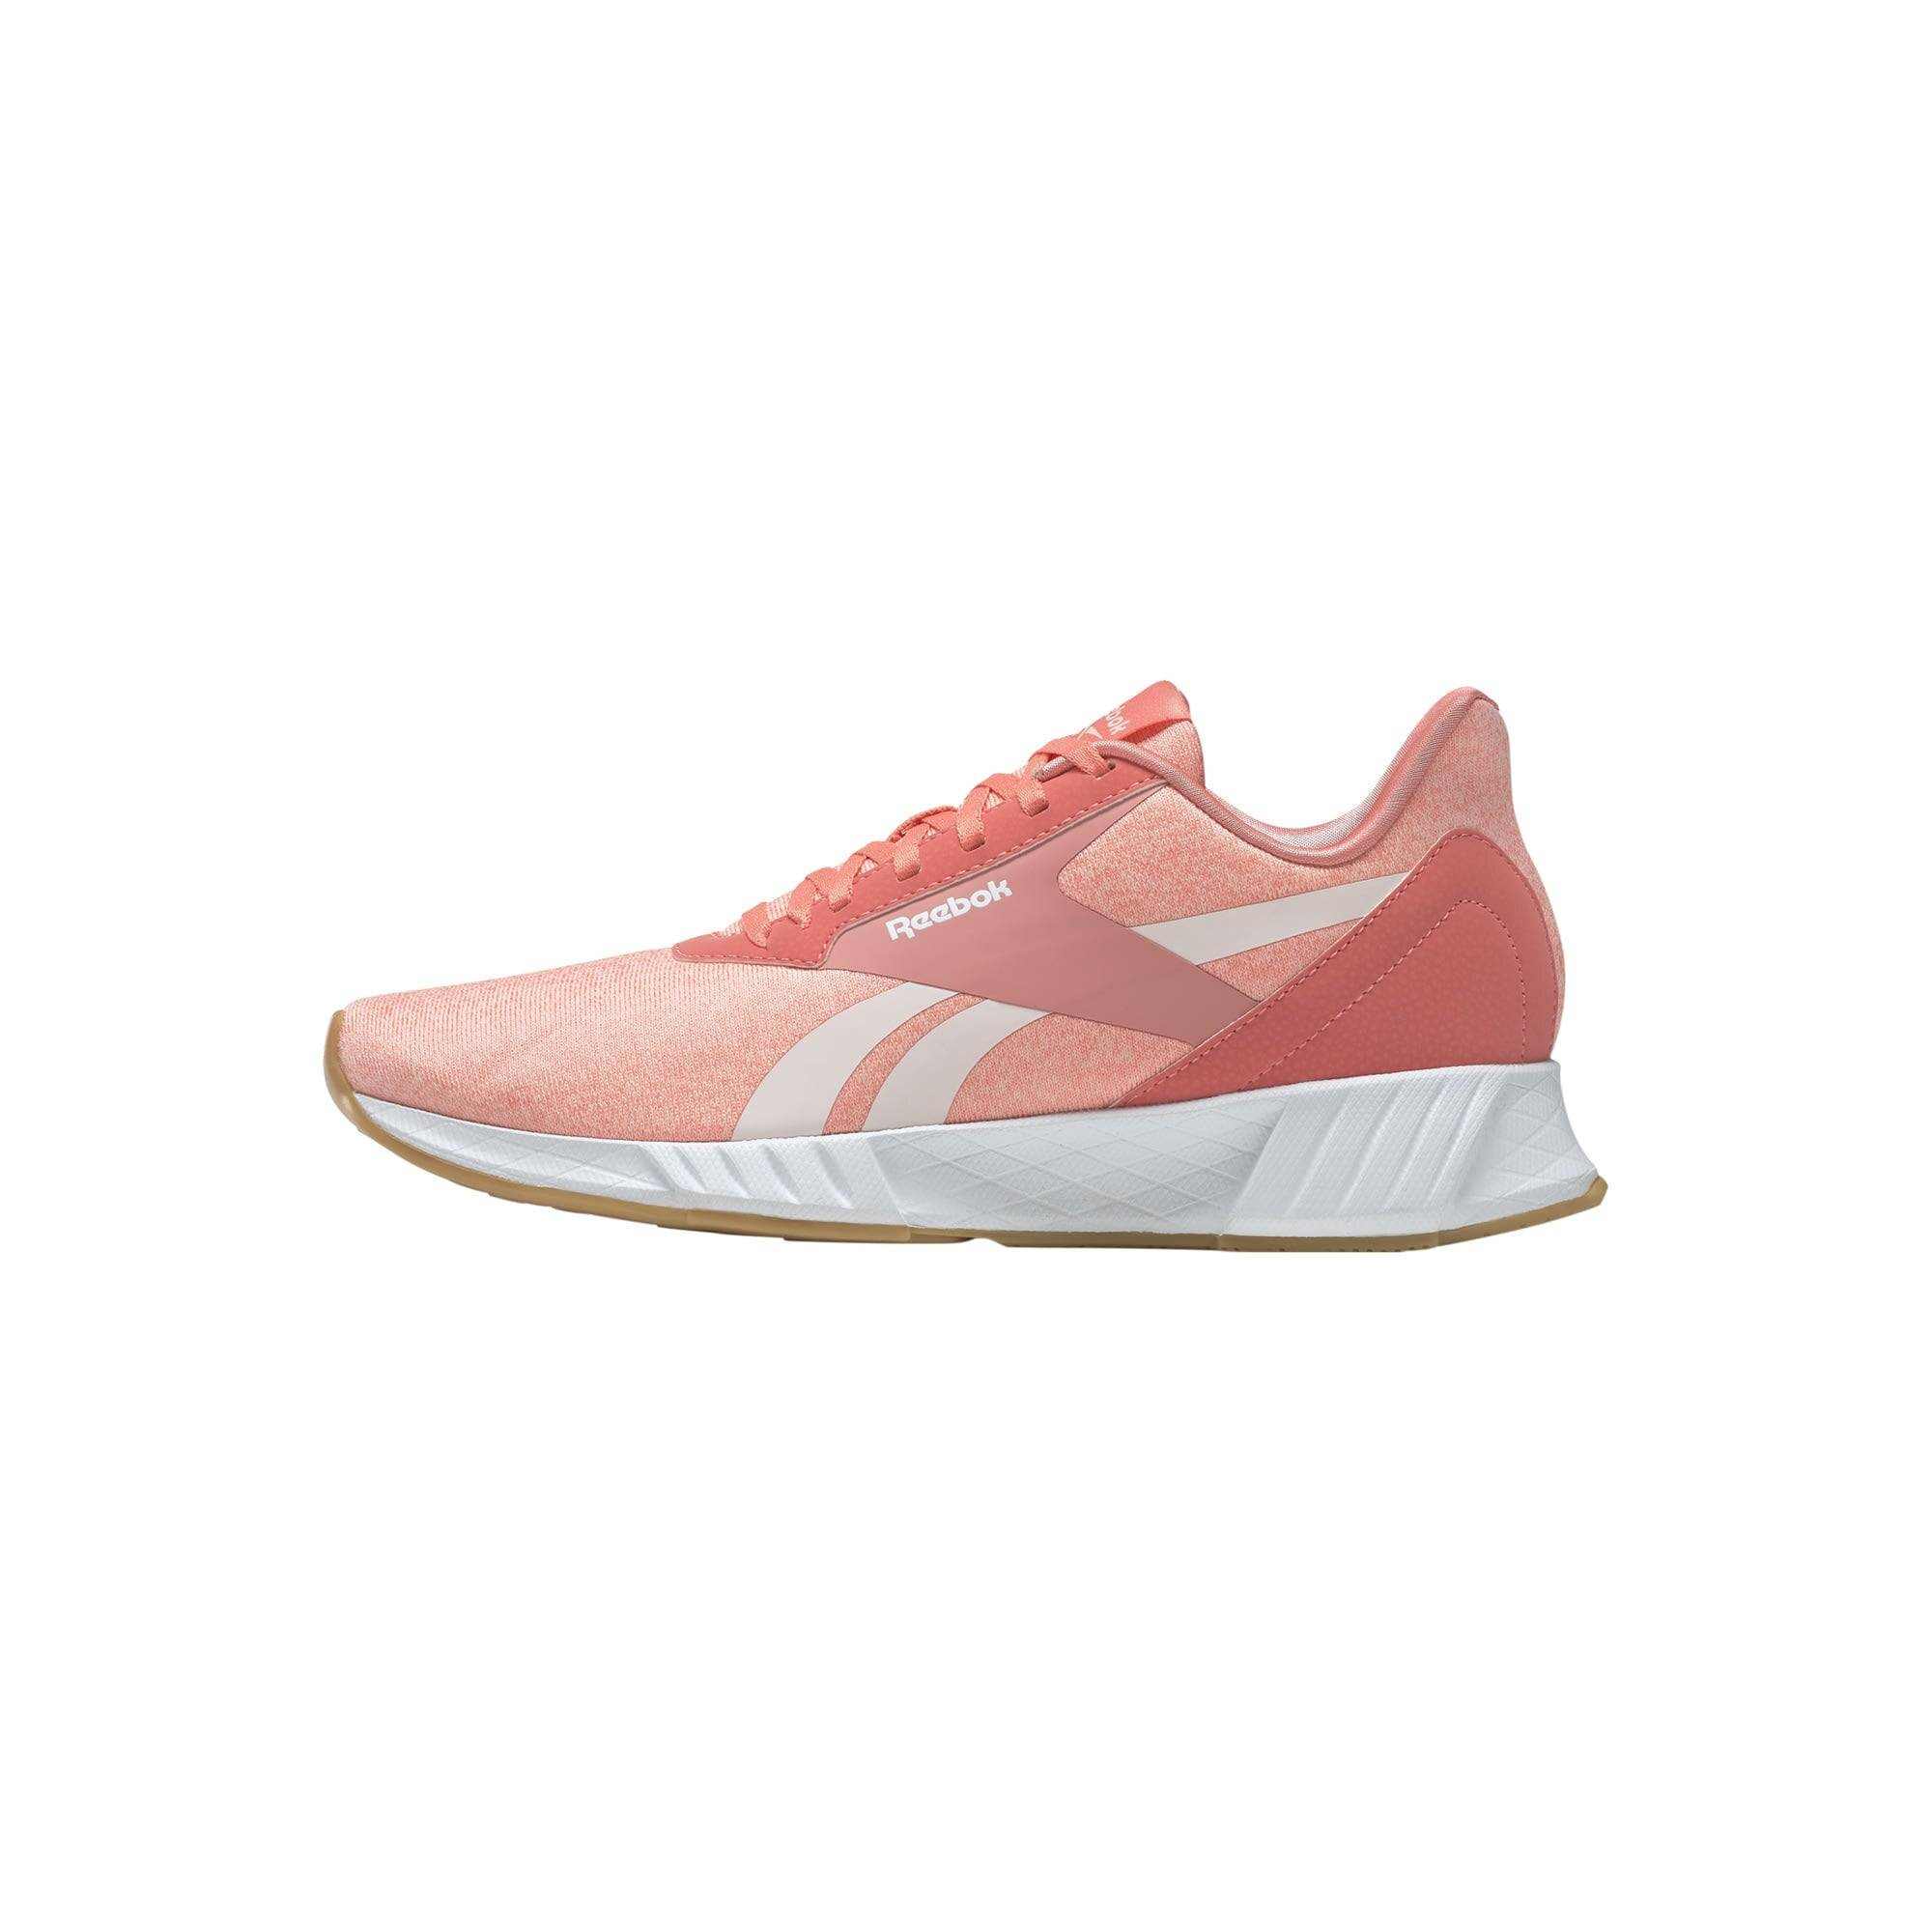 Reebok Sport Chaussure de course  - Rose - Taille: 7.5 - female